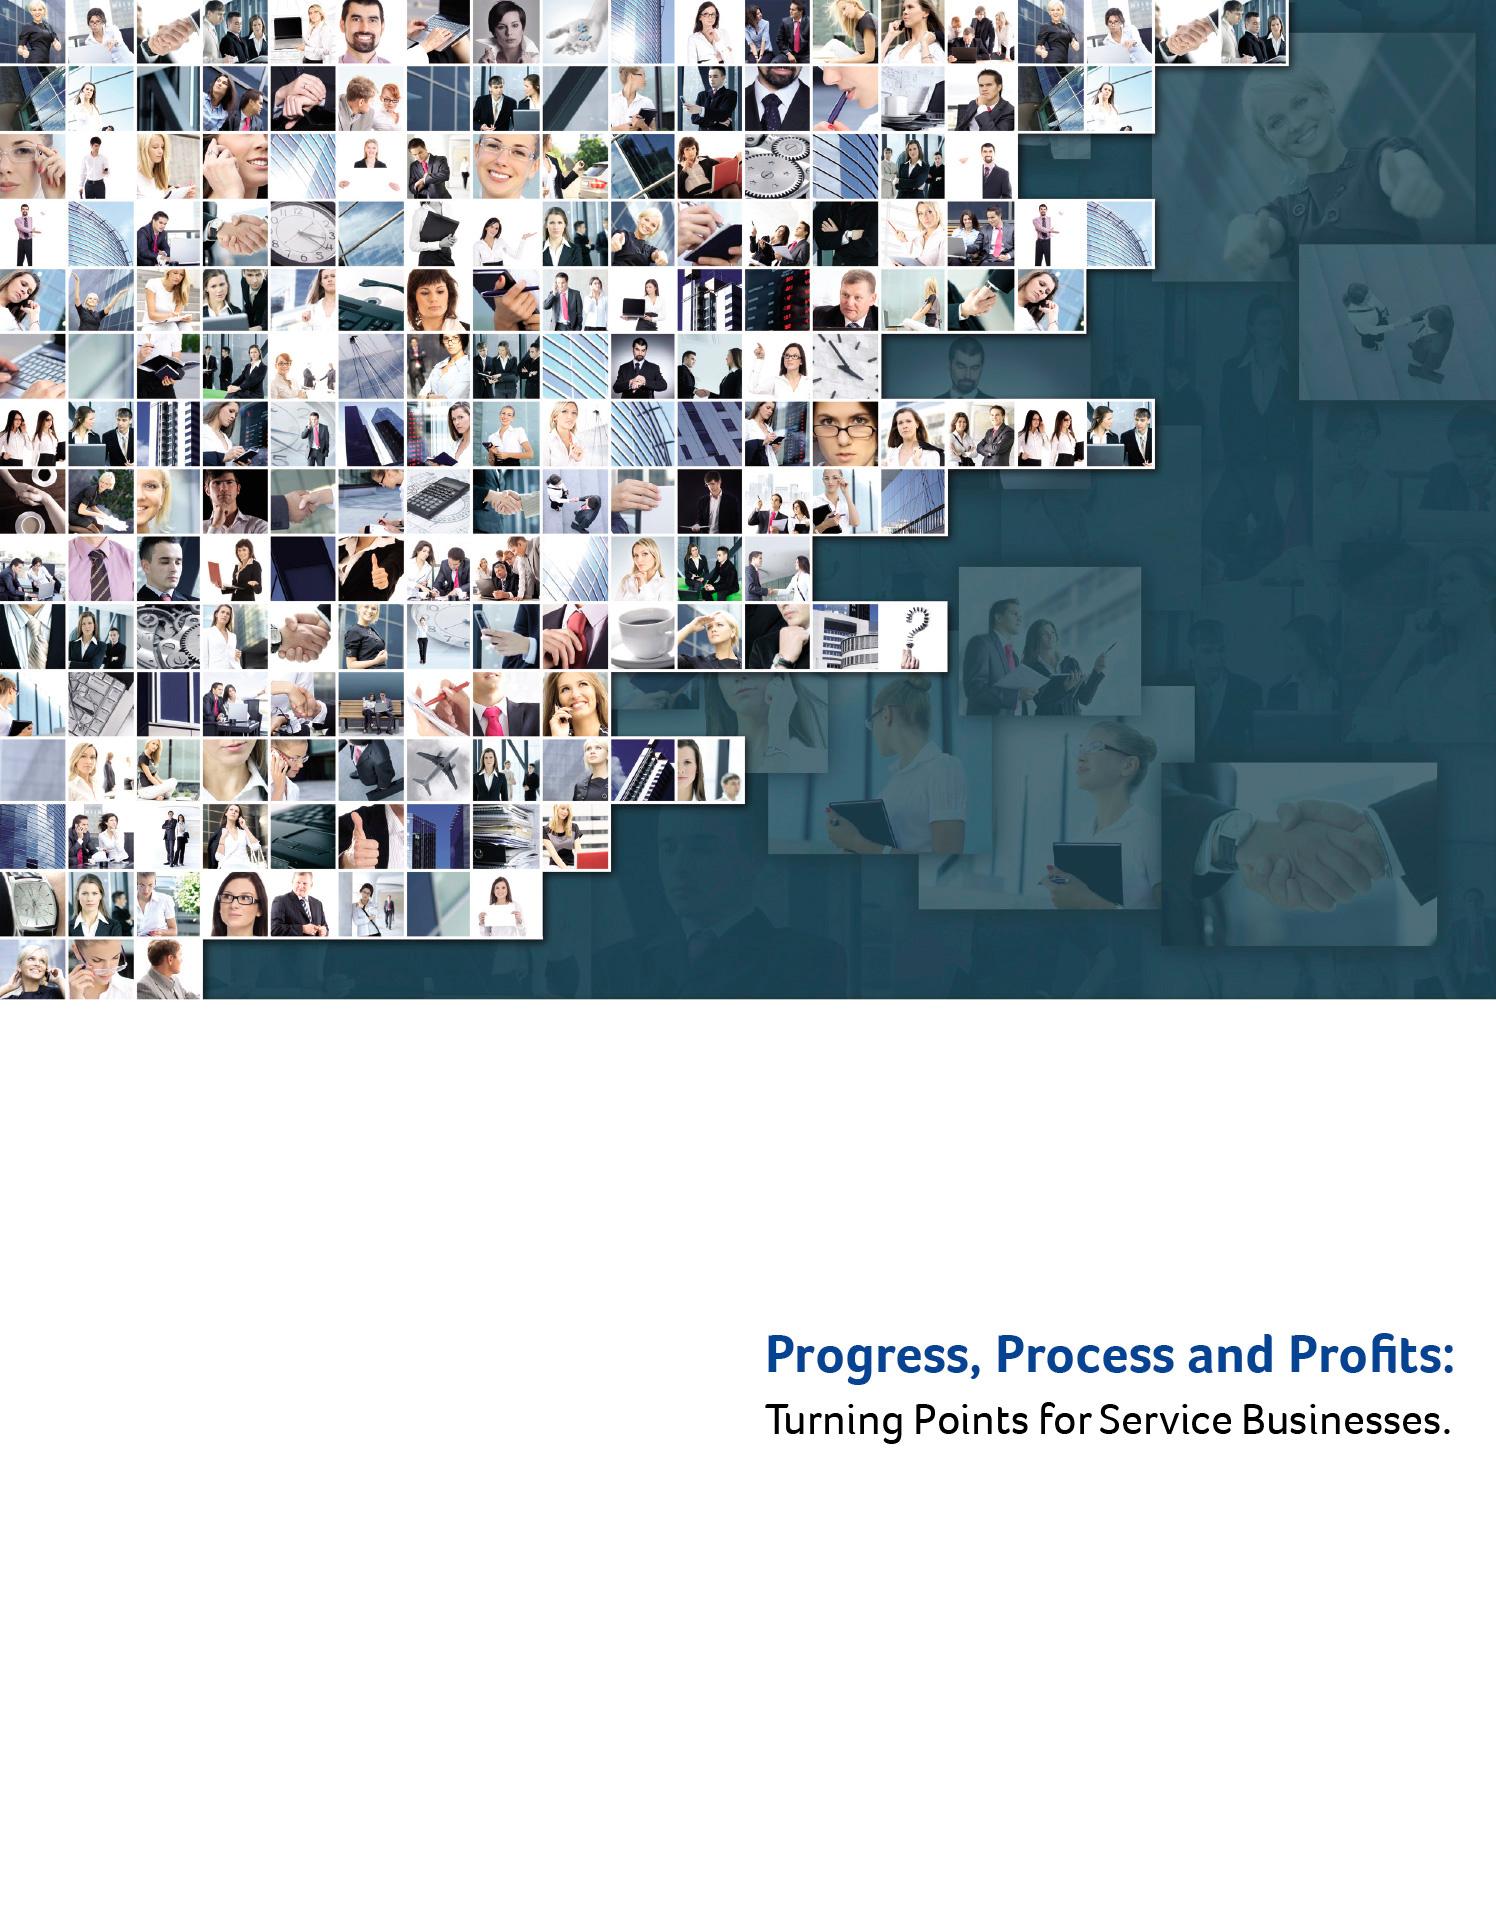 ProgressProcess&Profits_WP-1.jpg